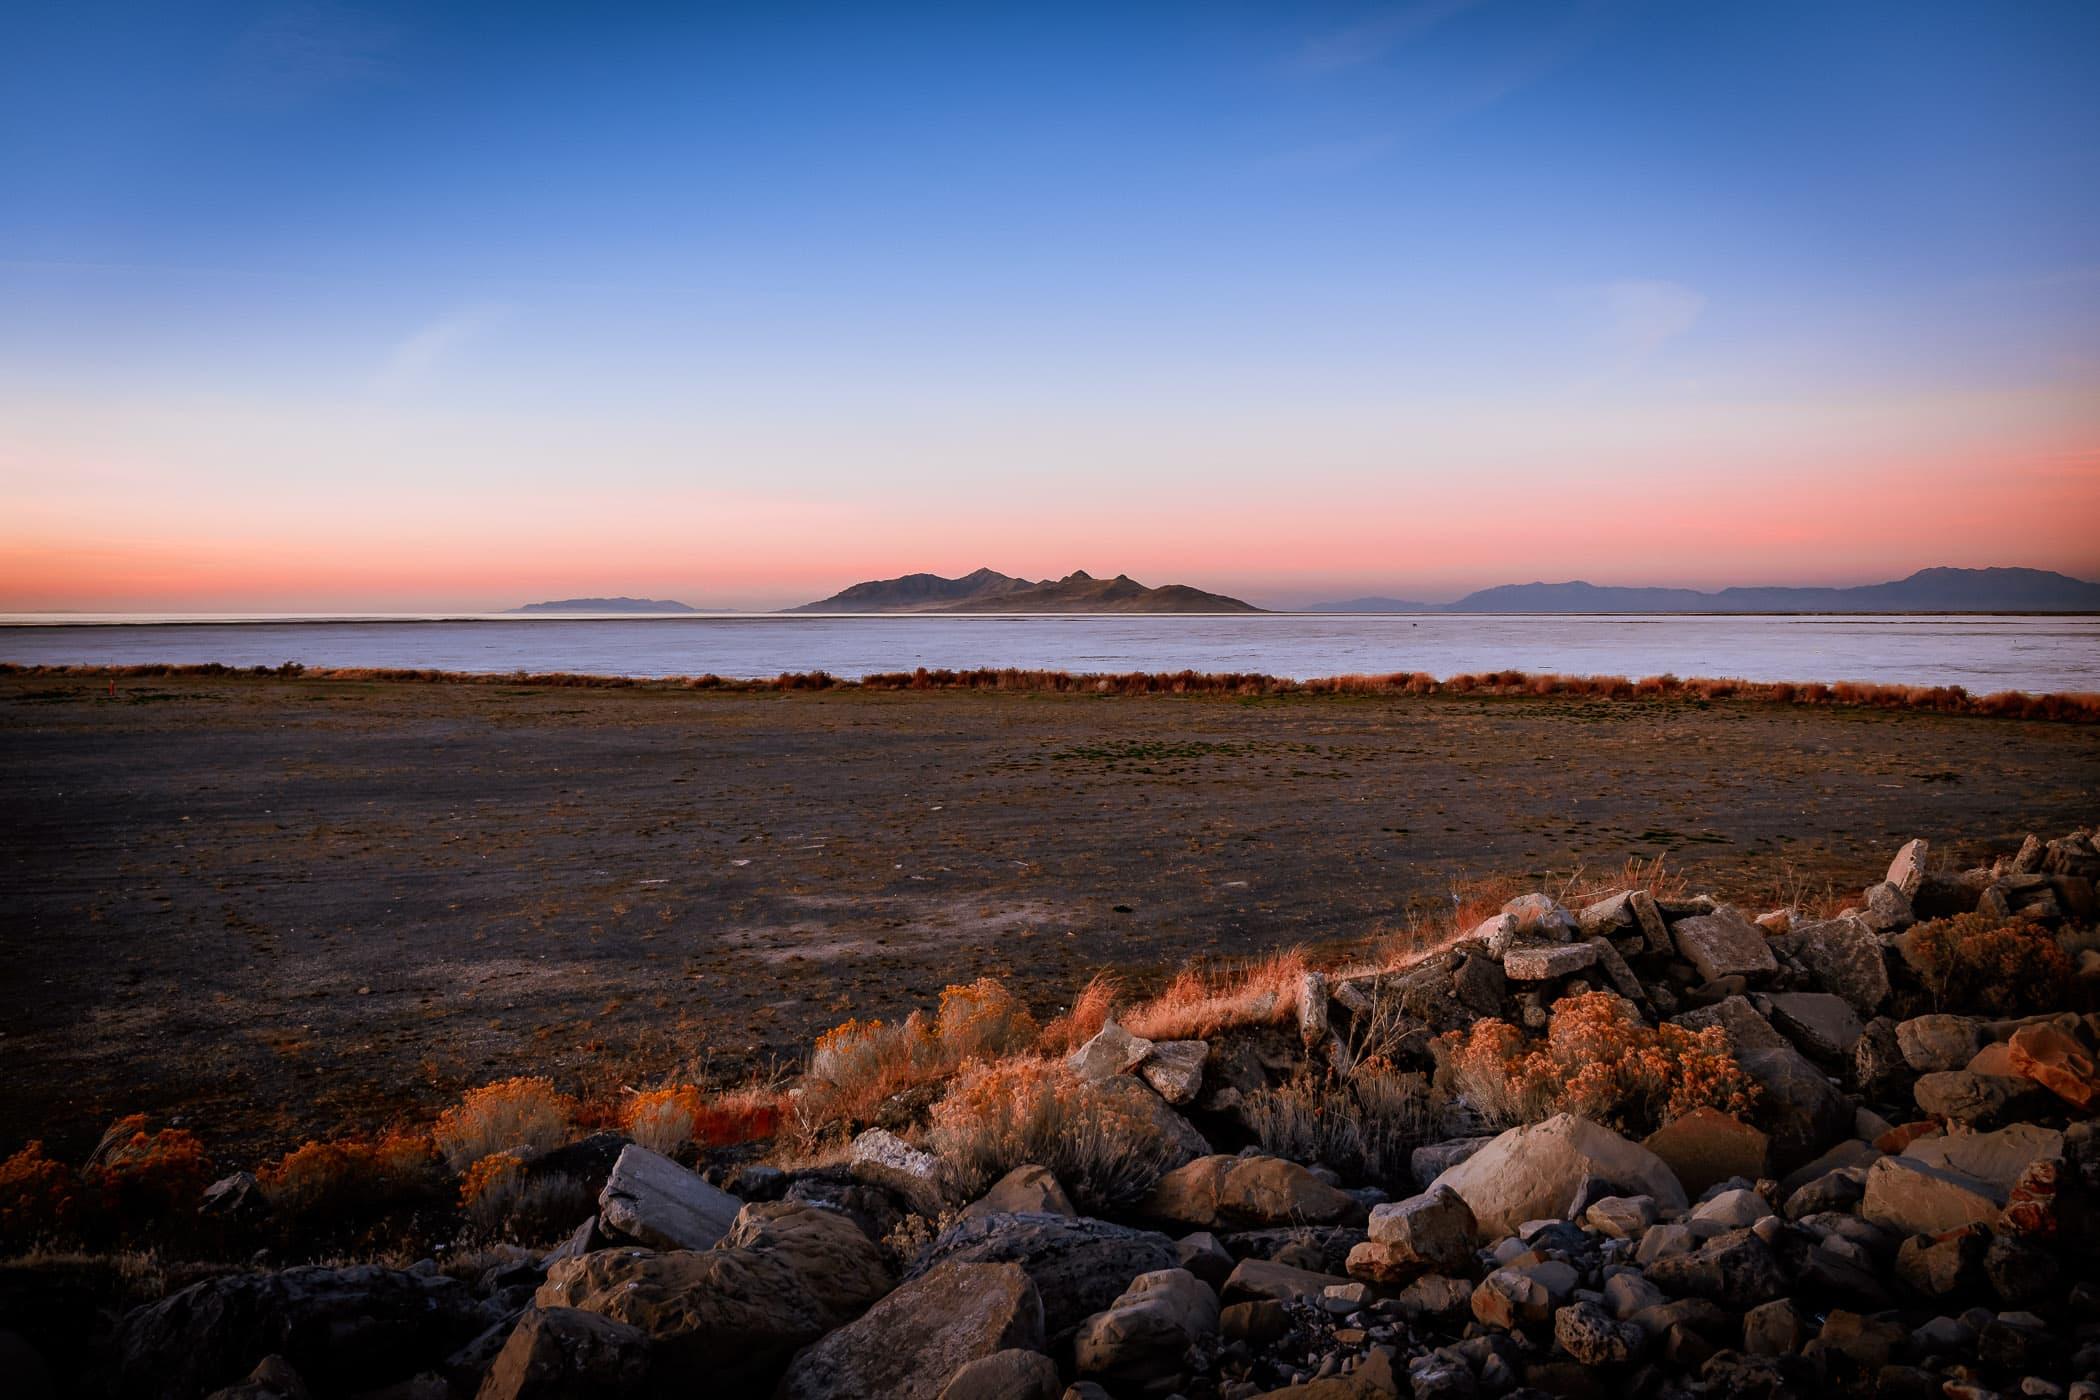 The last light of day on the Great Salt Lake, Utah.